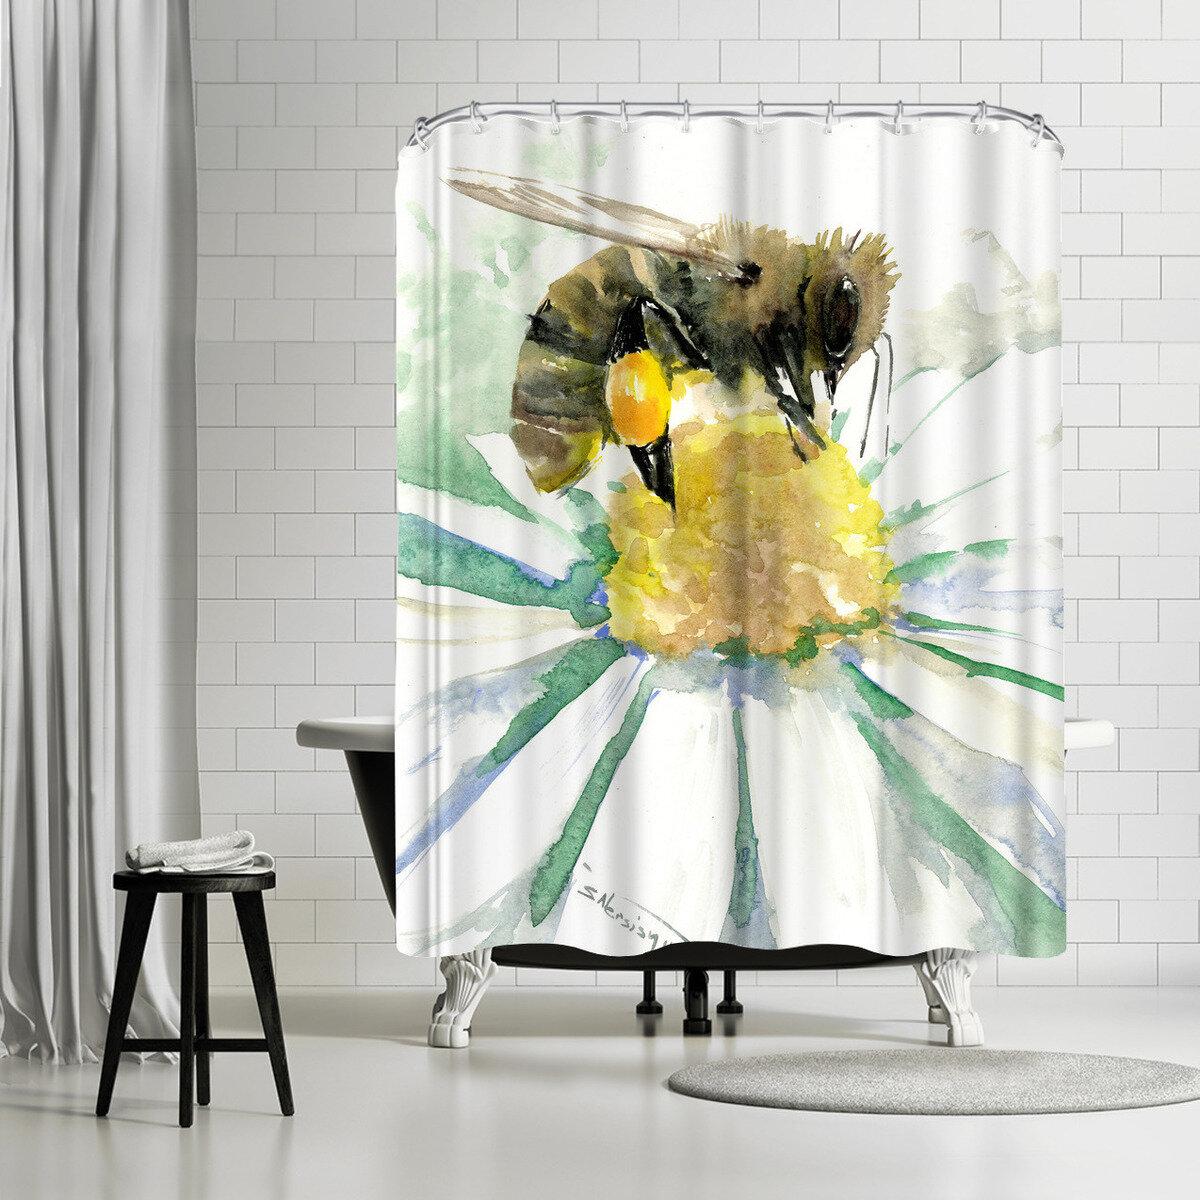 East Urban Home Suren Nersisyan Bee On Chamomile Single Shower Curtain Wayfair